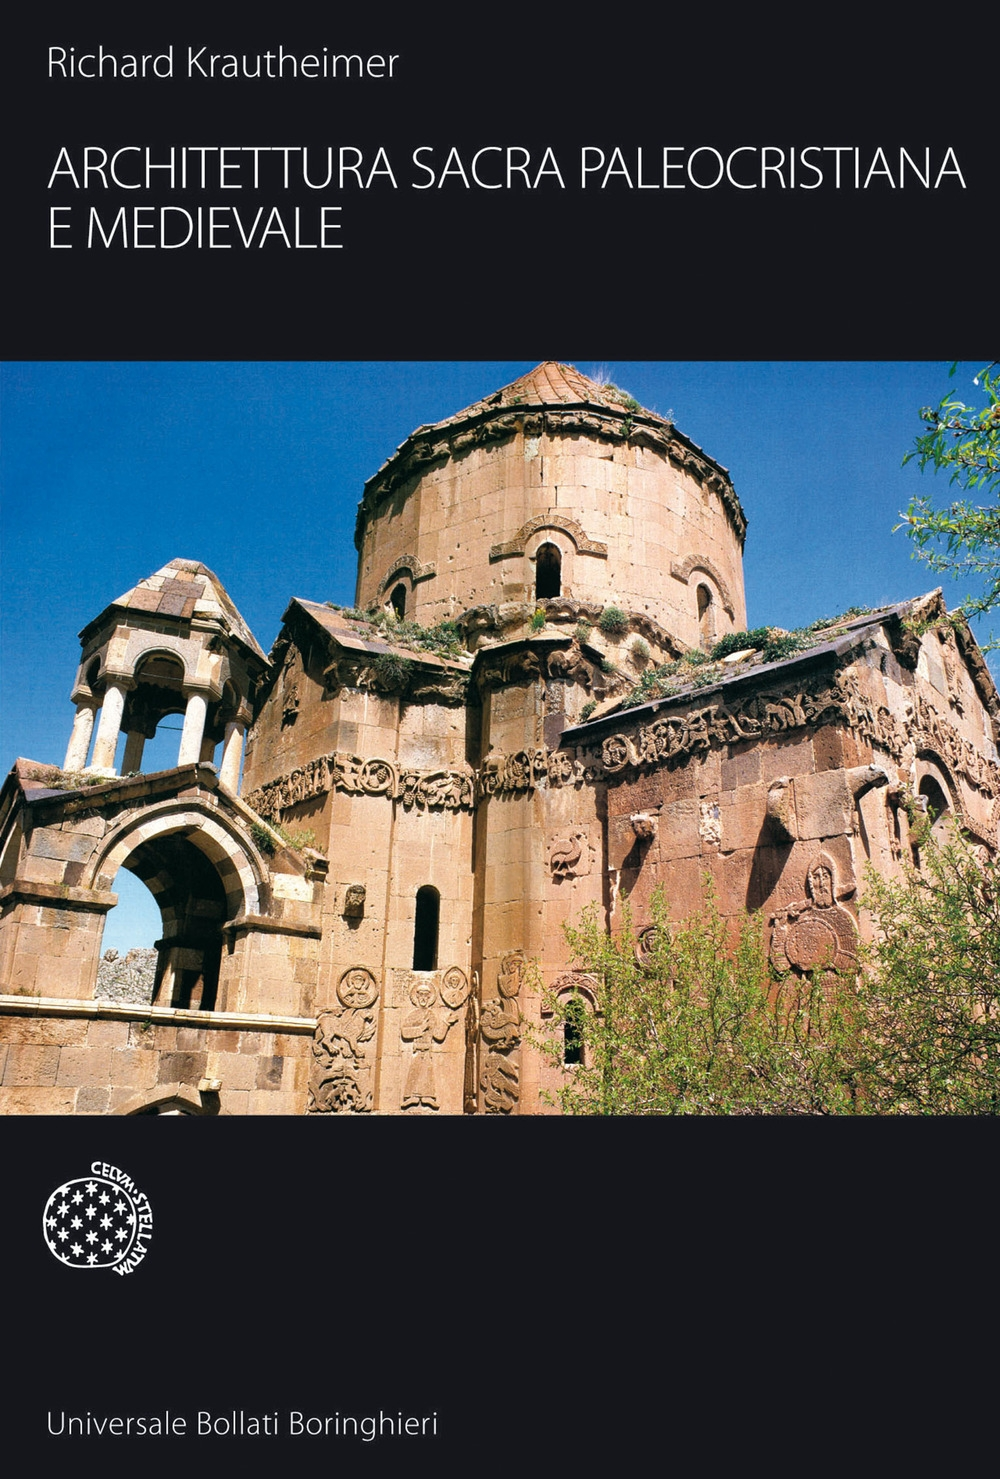 Architettura sacra paleocristiana e medievale e altri saggi su Rinascimento e Barocco - Krautheimer Richard